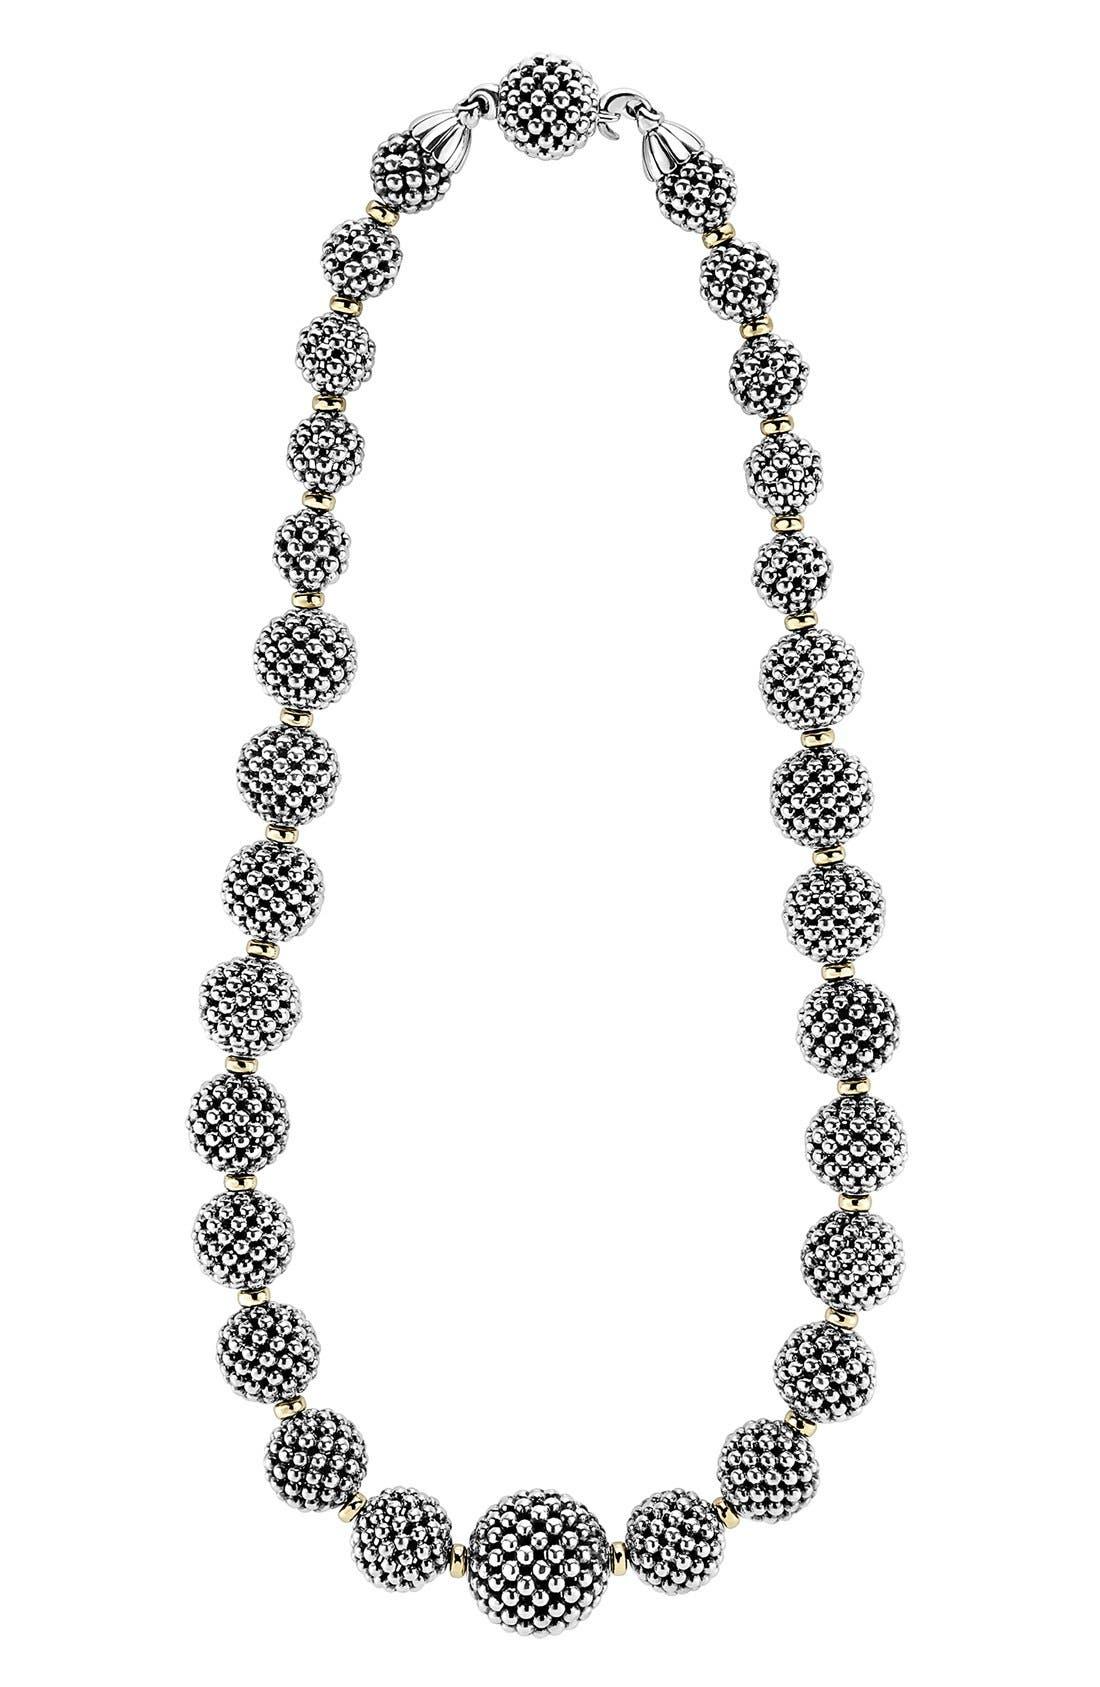 'Caviar Forever' Lattice Ball Necklace,                             Main thumbnail 1, color,                             SILVER